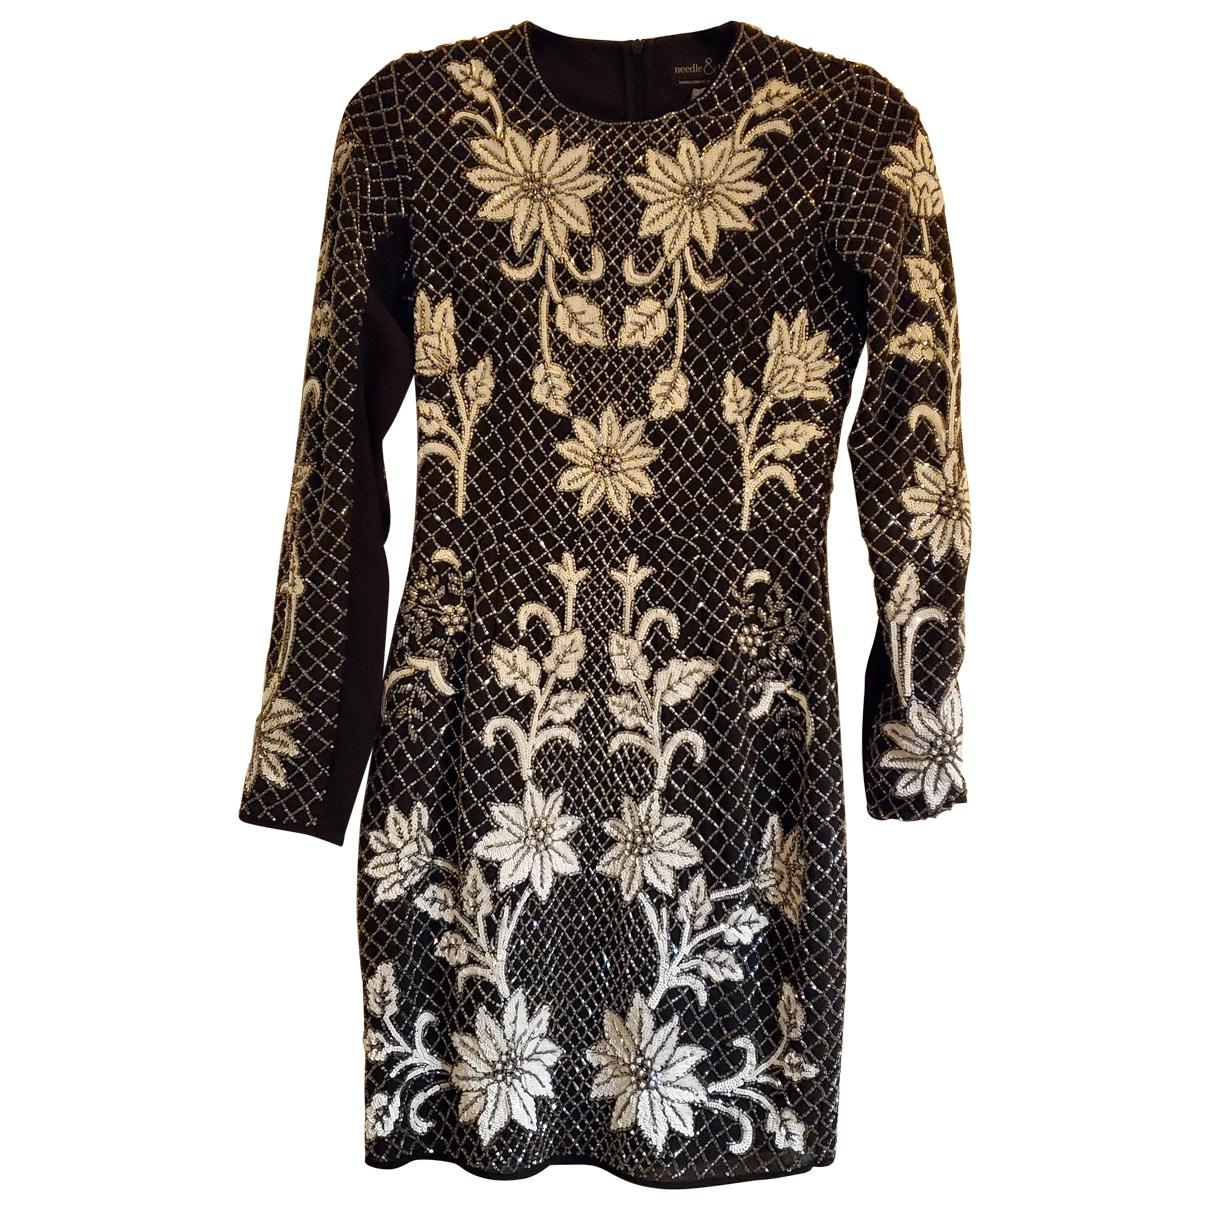 Needle & Thread \N Black dress for Women 2 US